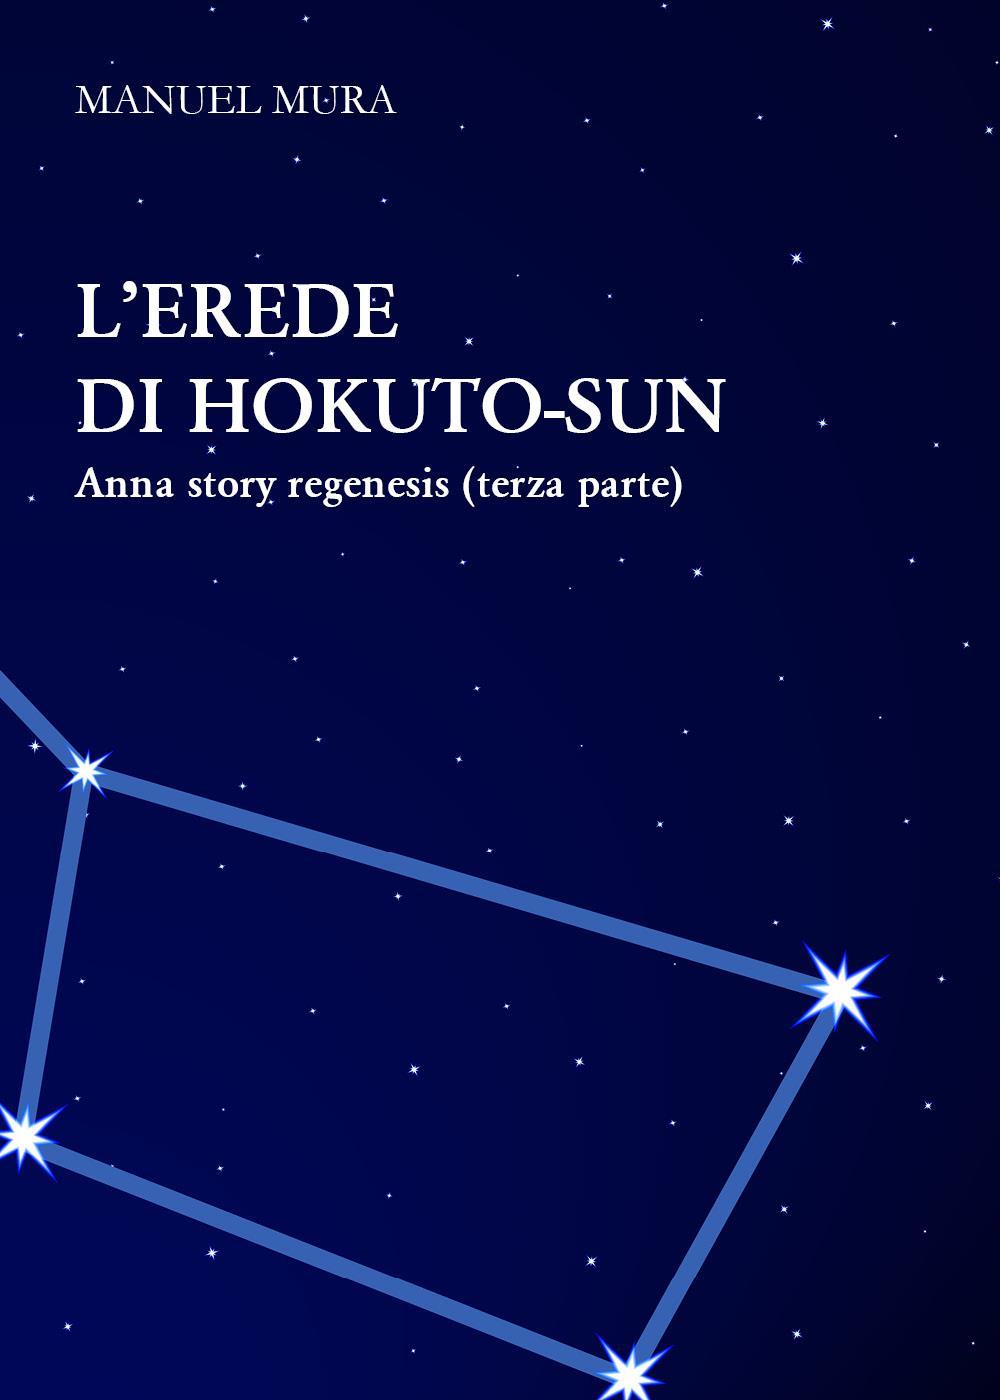 L'erede di Hokuto-Sun - Anna Story Regenesis terza parte